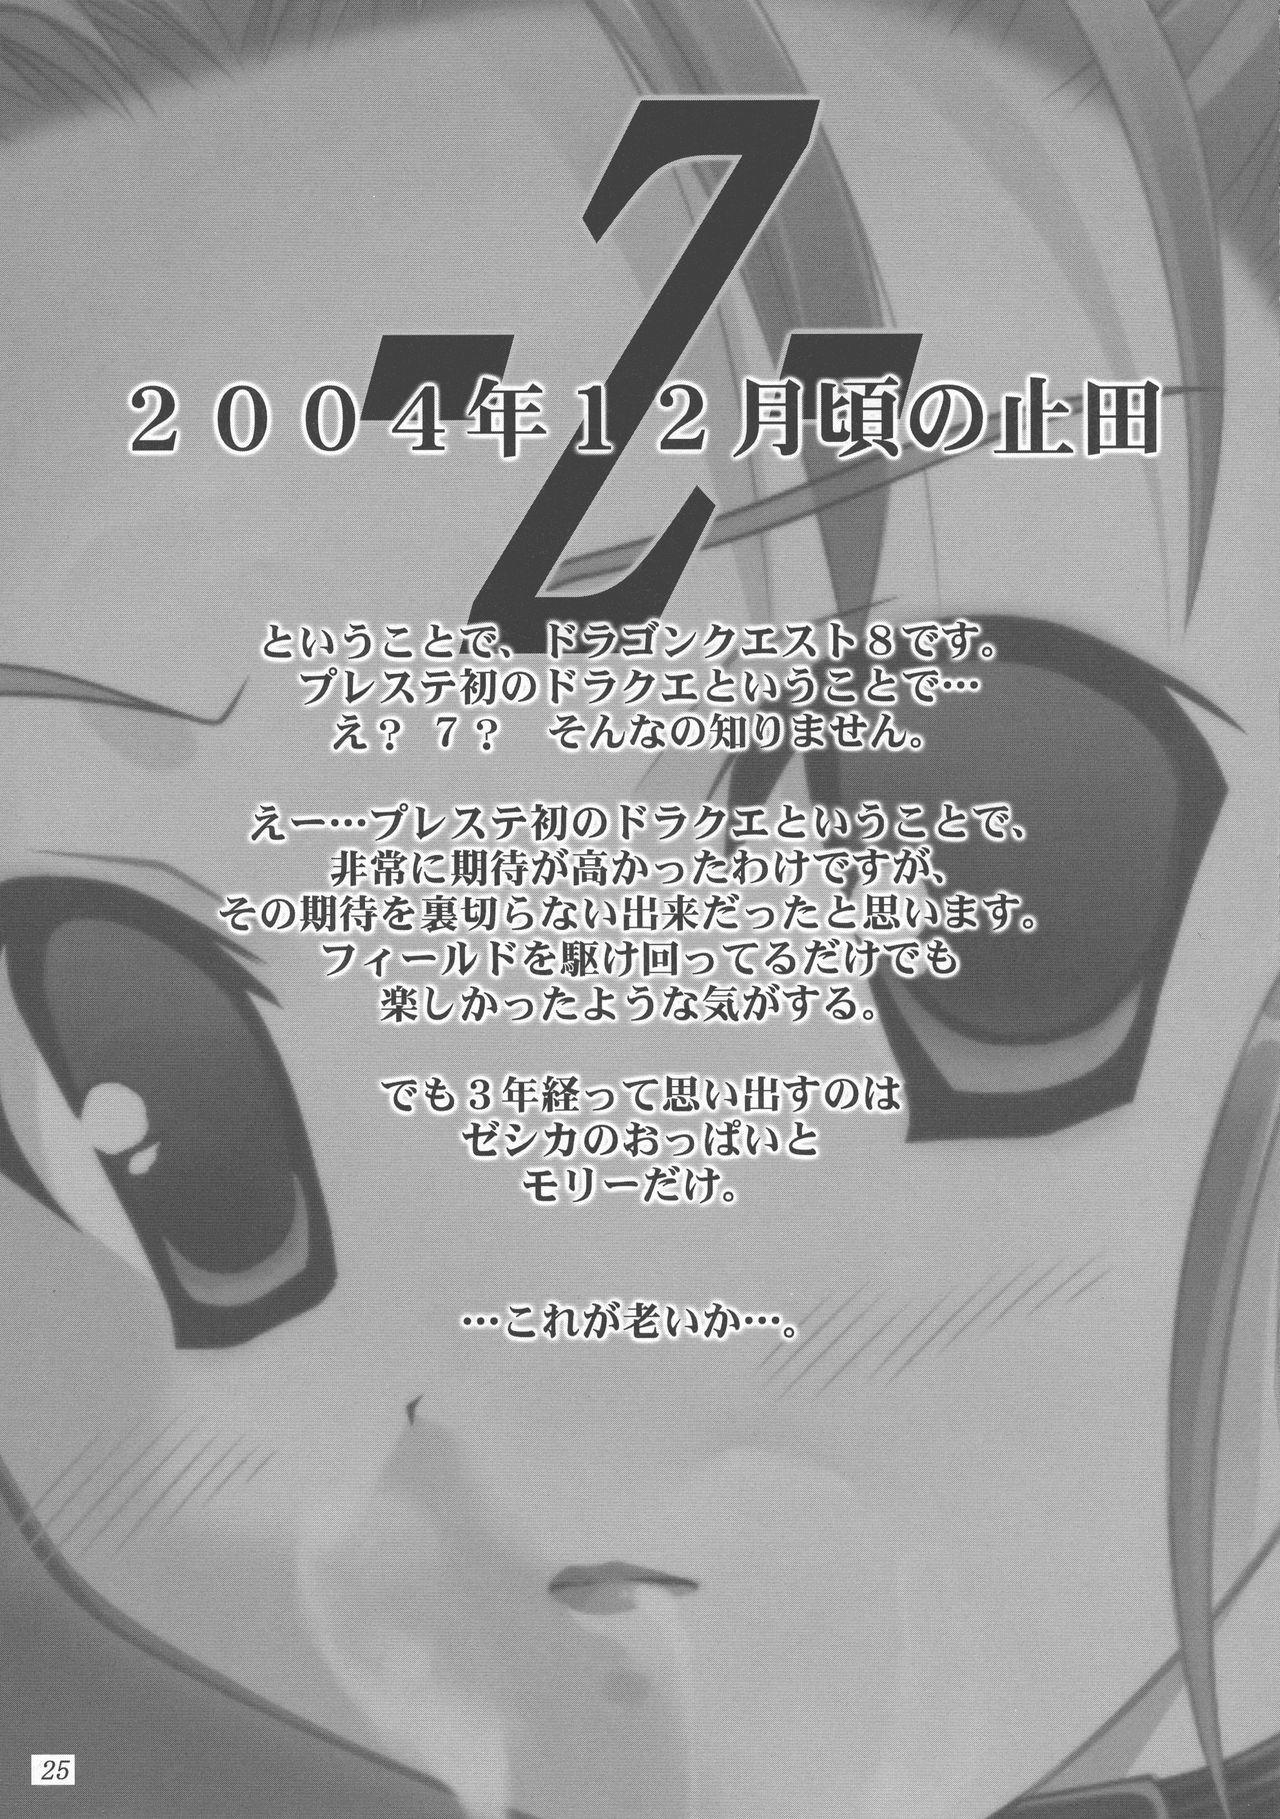 (C73) [ashitakara-ganbaru (Yameta Takashi)] ZIG-ZIG-ZIG 3 -2004~2005- (Various) 24